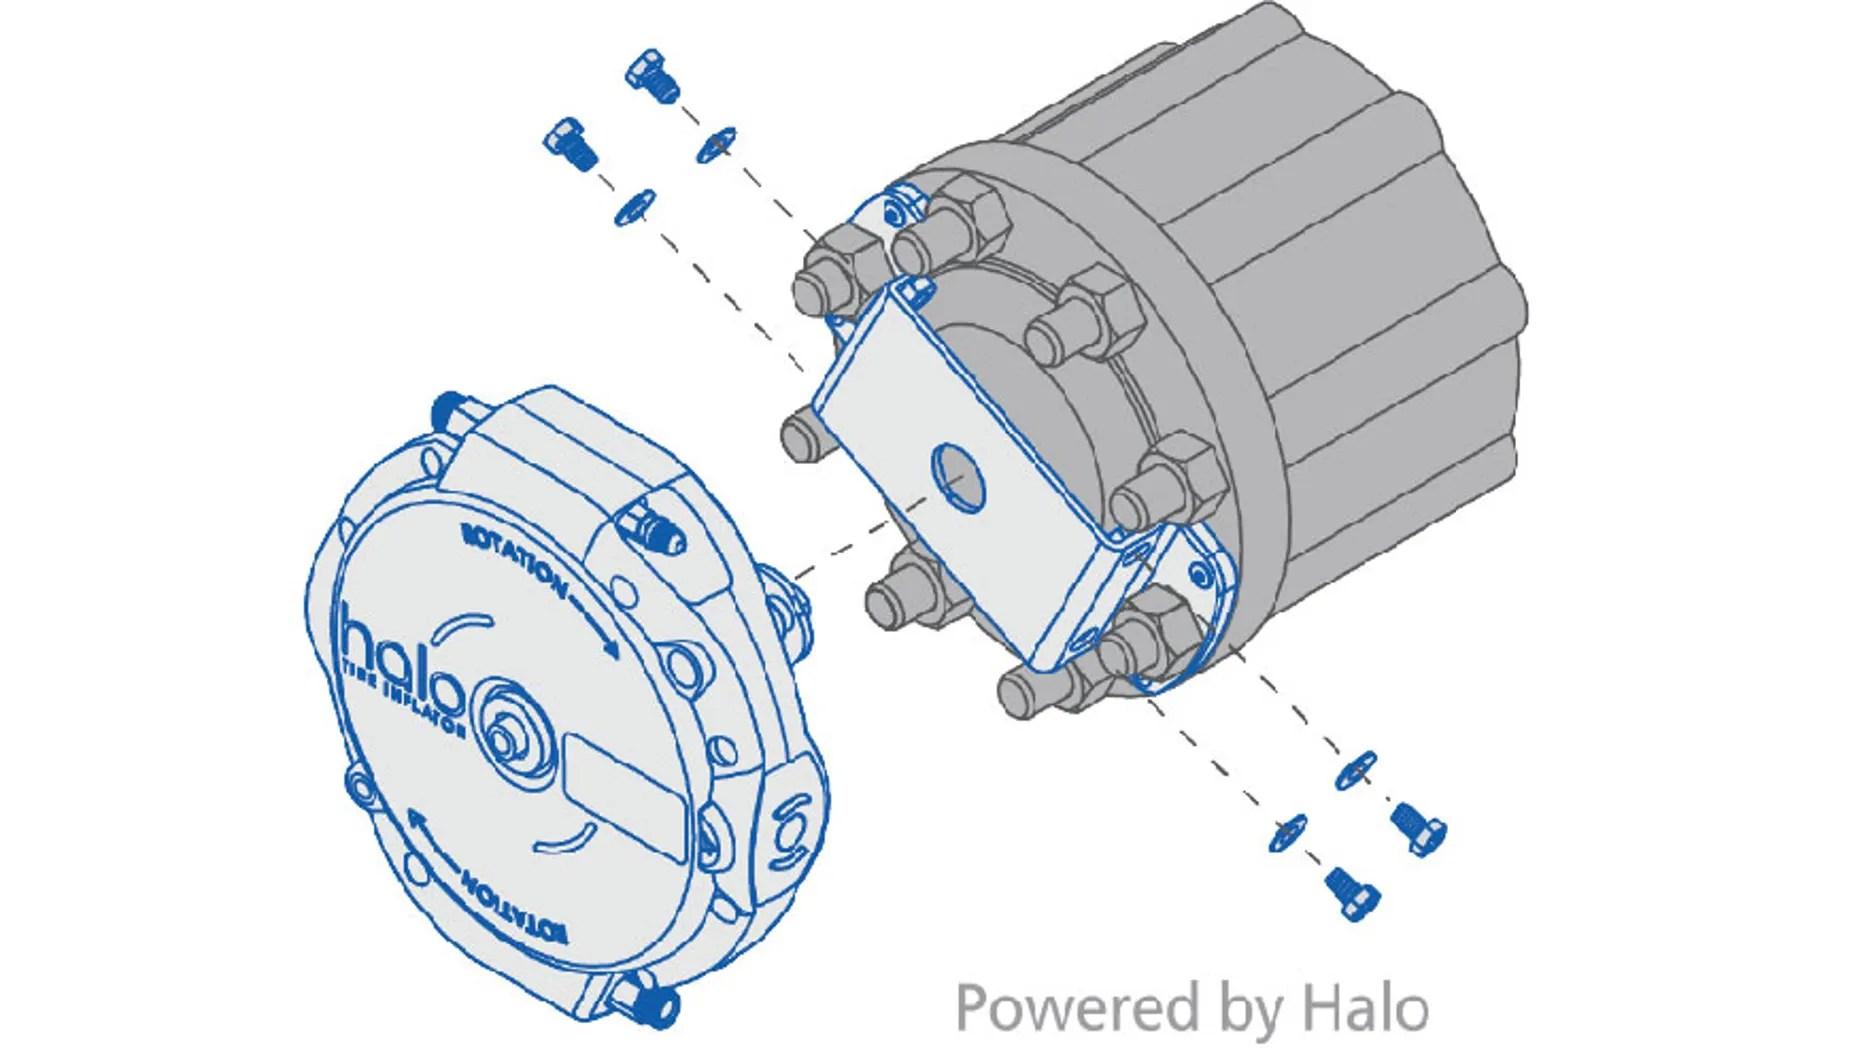 tire diagram of drum wiring diagram datasource tire diagram of drum [ 1862 x 1048 Pixel ]